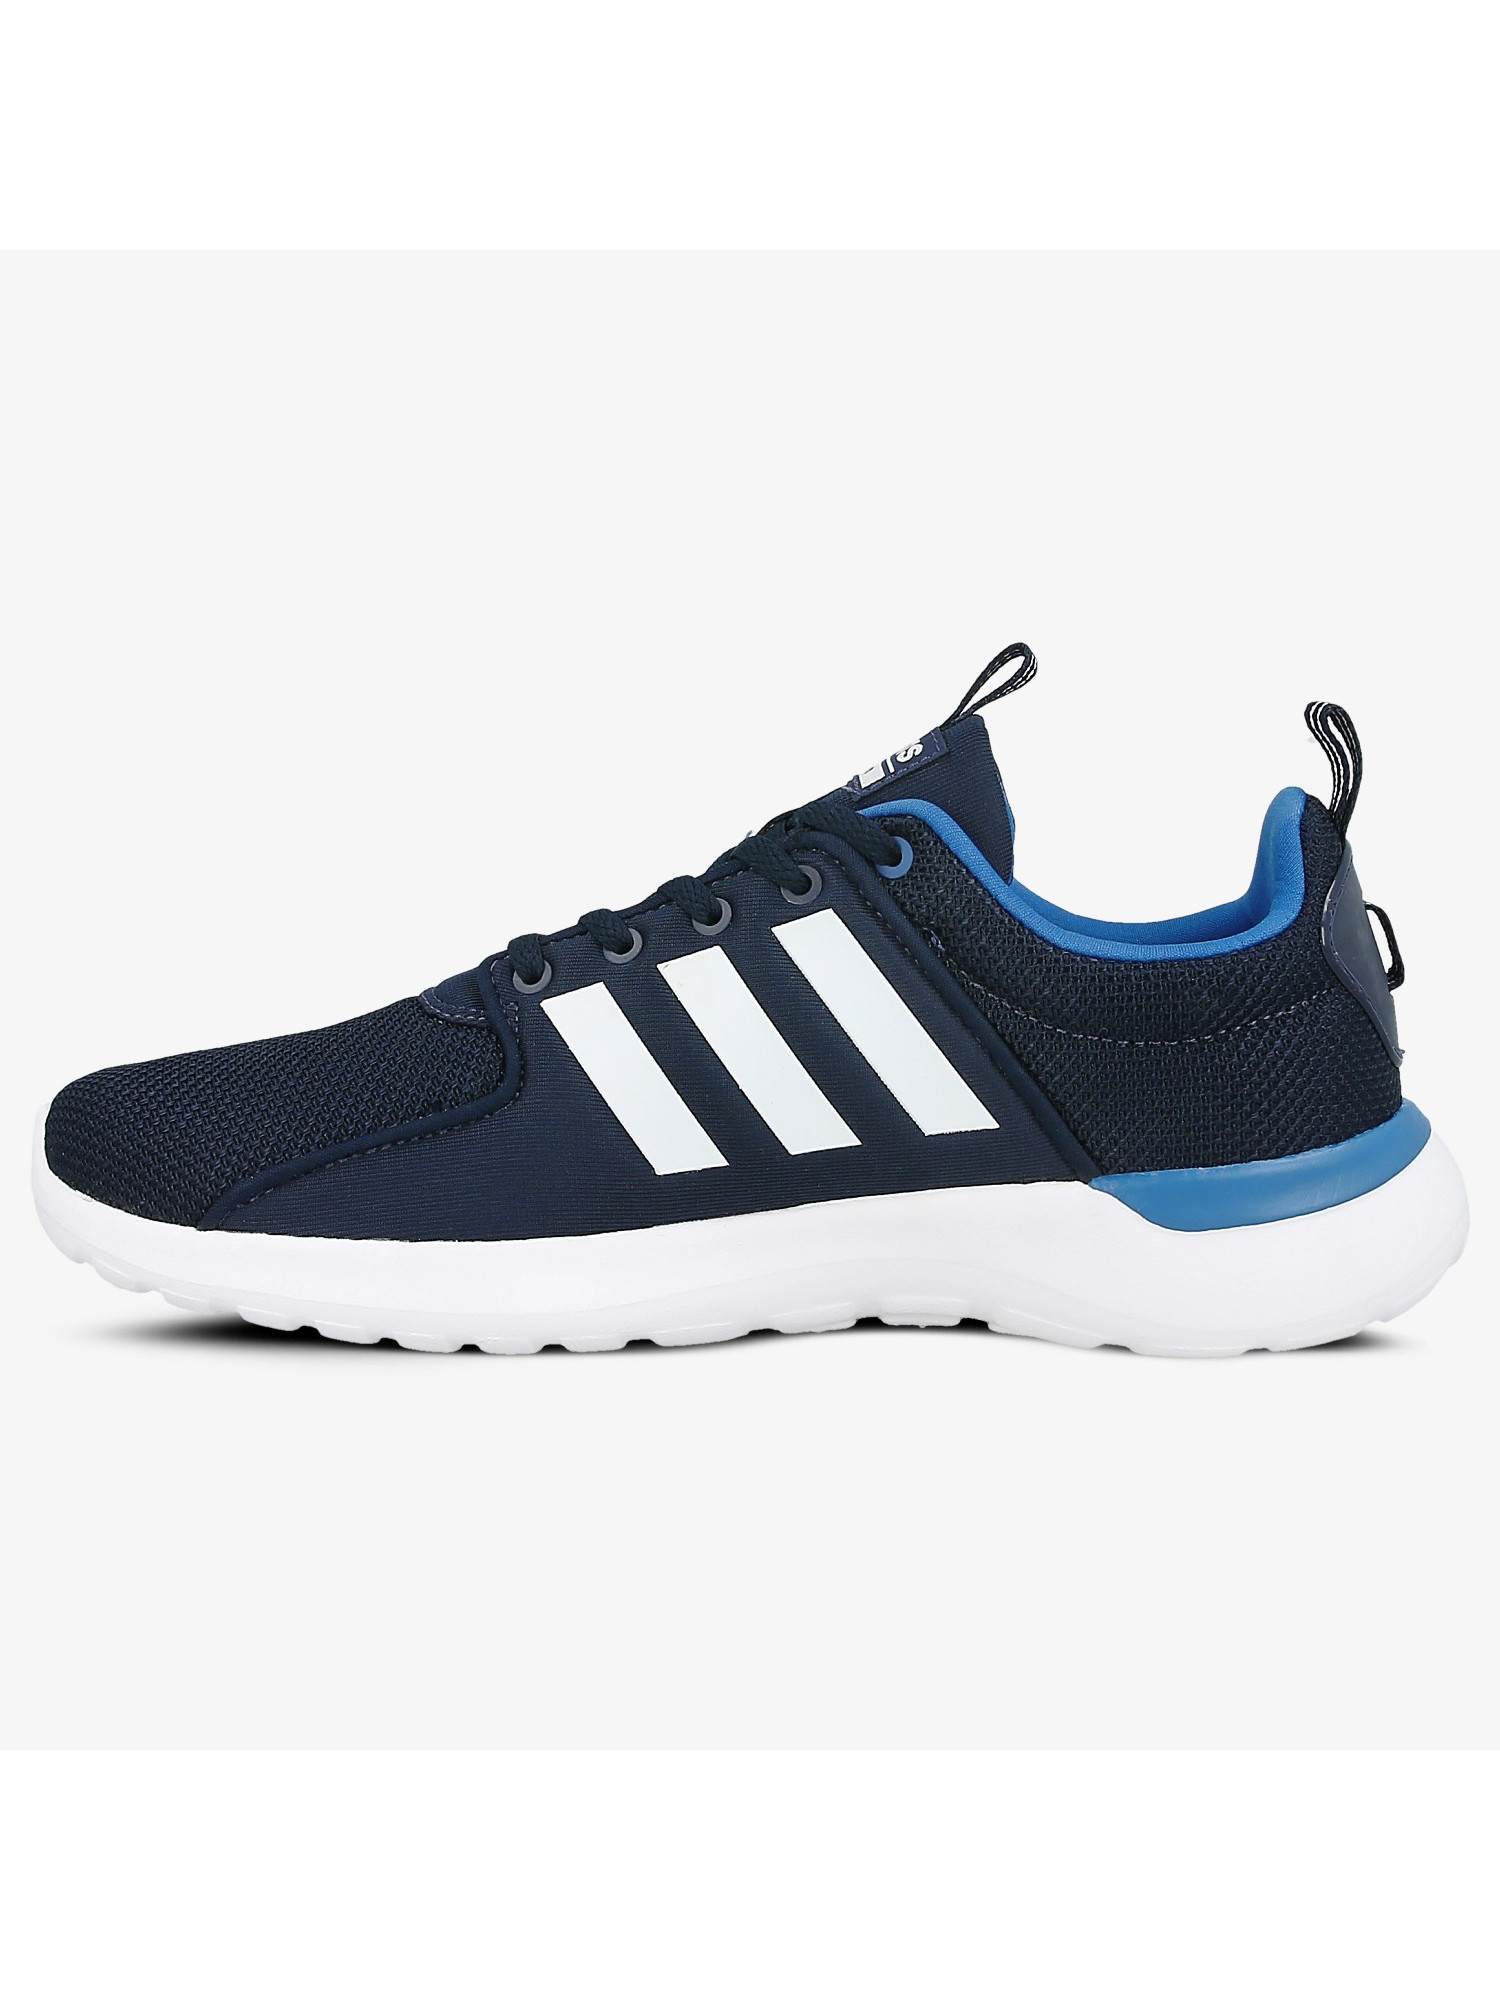 BB9821 Adidas Scarpe Sneakers Trainers Tennis Blu Lite Racer Running ... 89ba7c61118e5